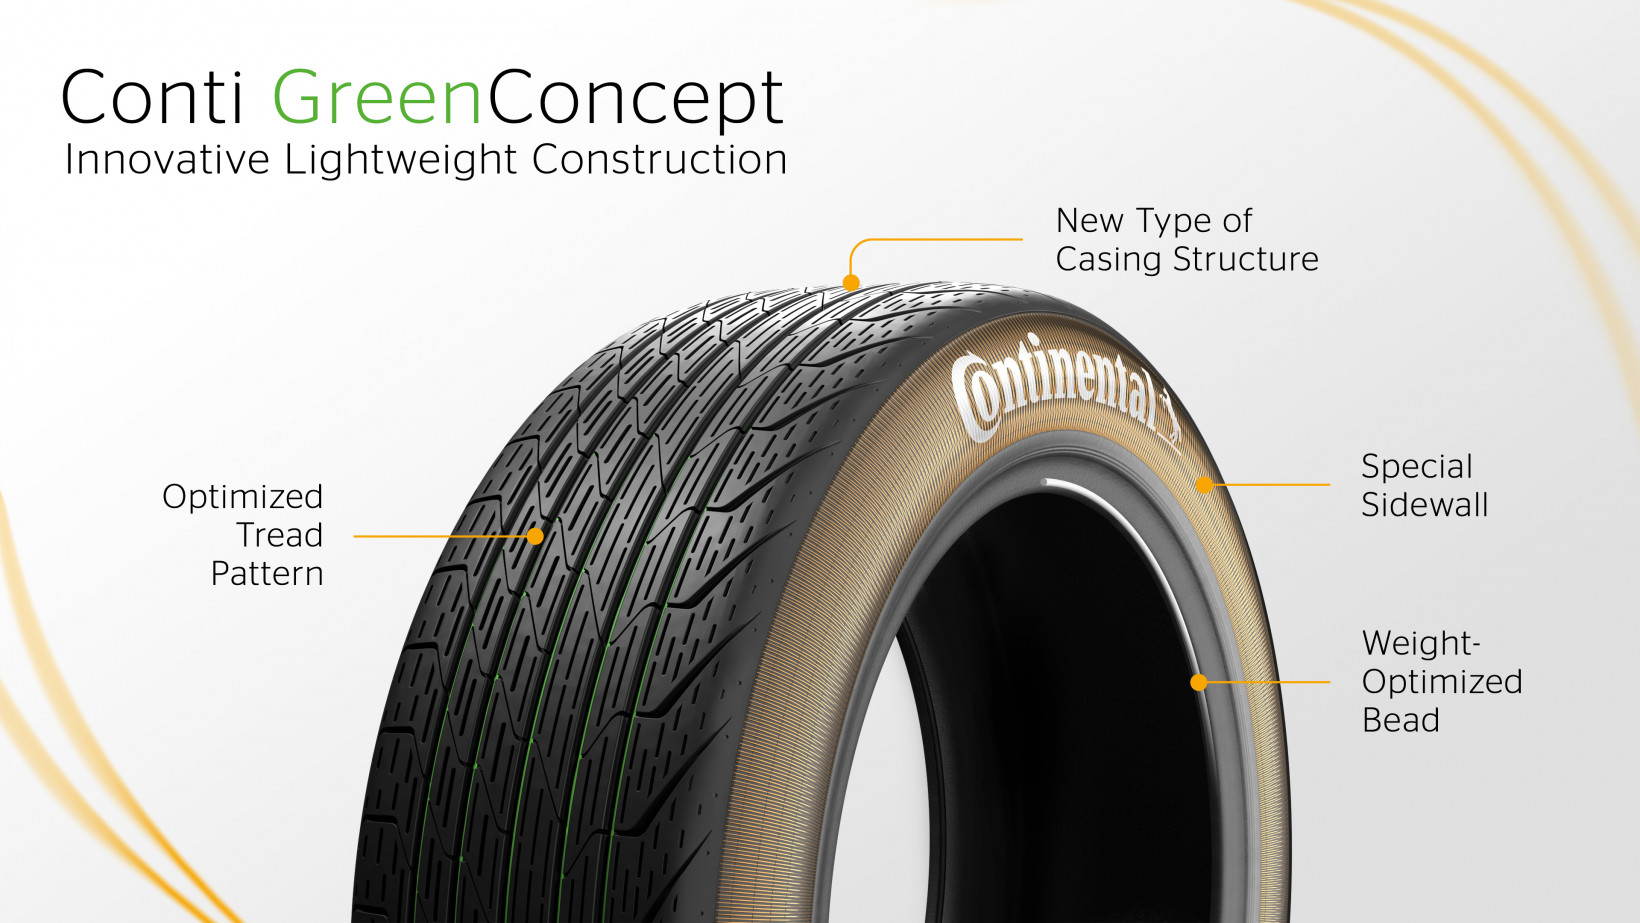 Continental Green Concept